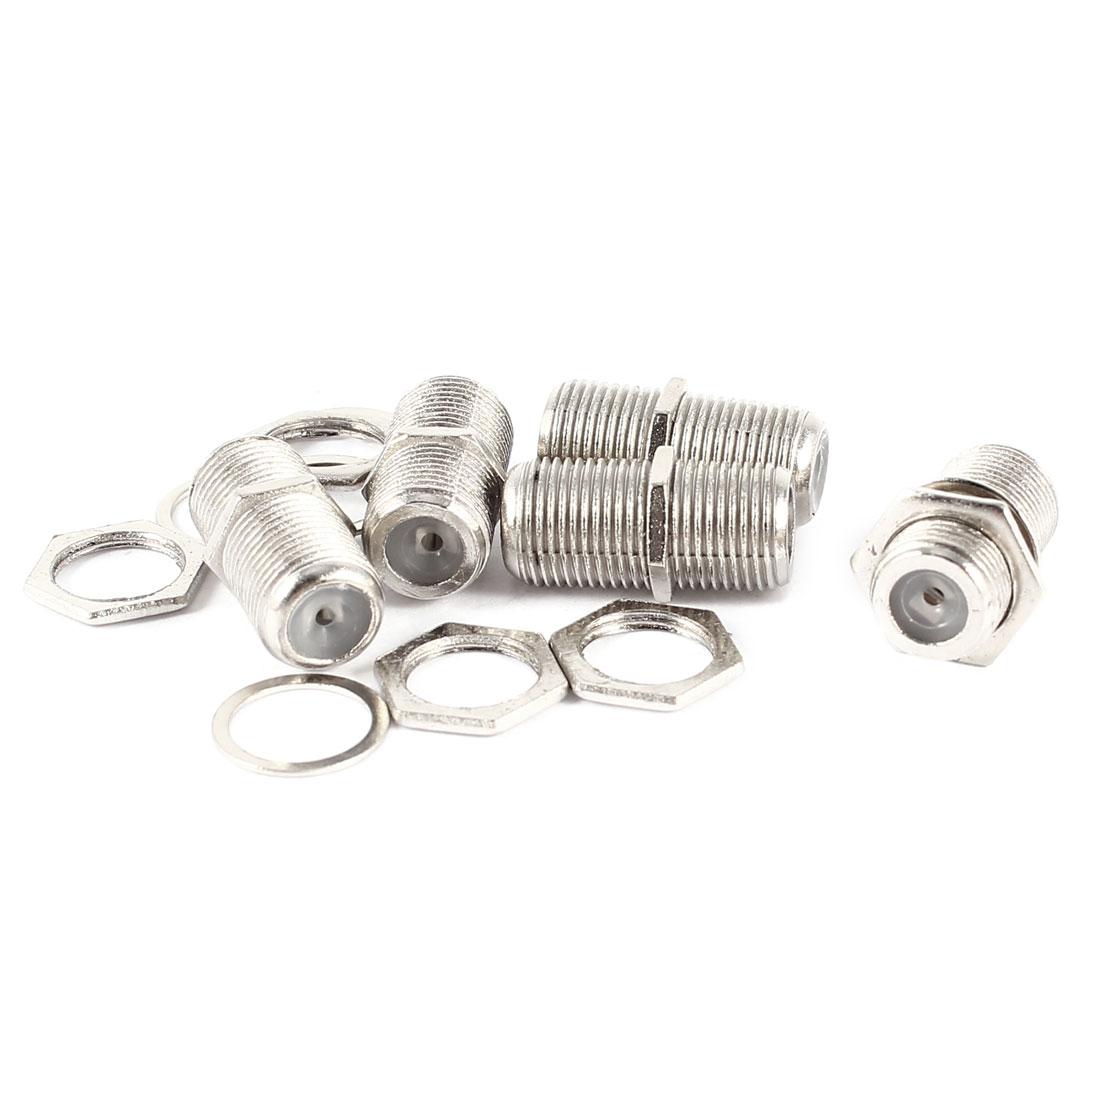 5 Pieces F-Type Female Jack Socket F/F RF Coax TV Adapter Connectors Silver Tone